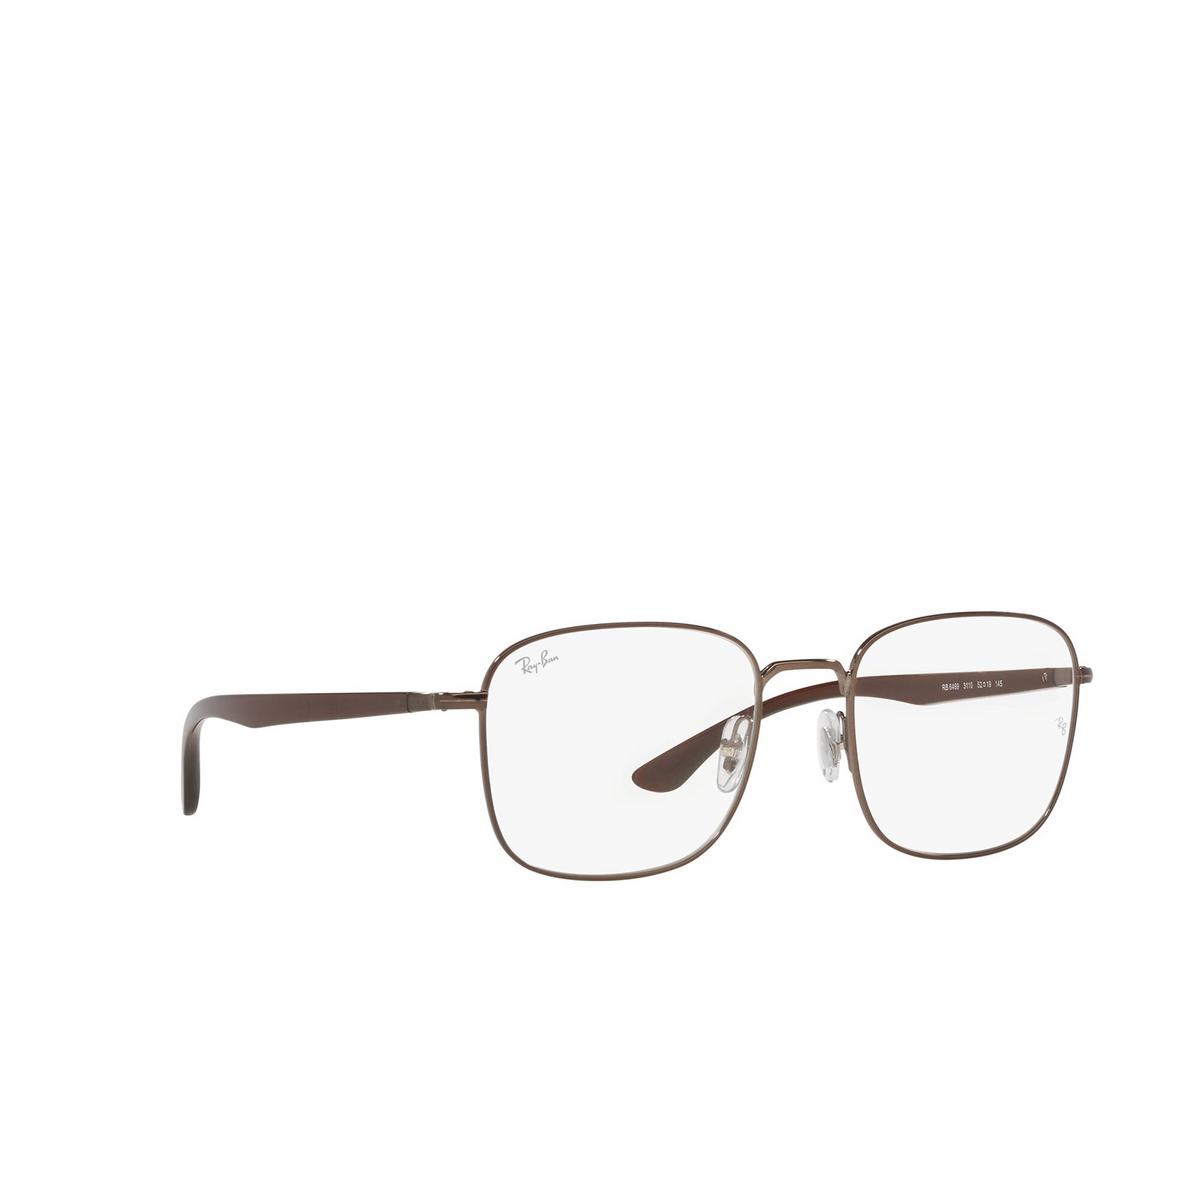 Ray-Ban® Square Eyeglasses: RX6469 color Dark Brown 3110 - three-quarters view.